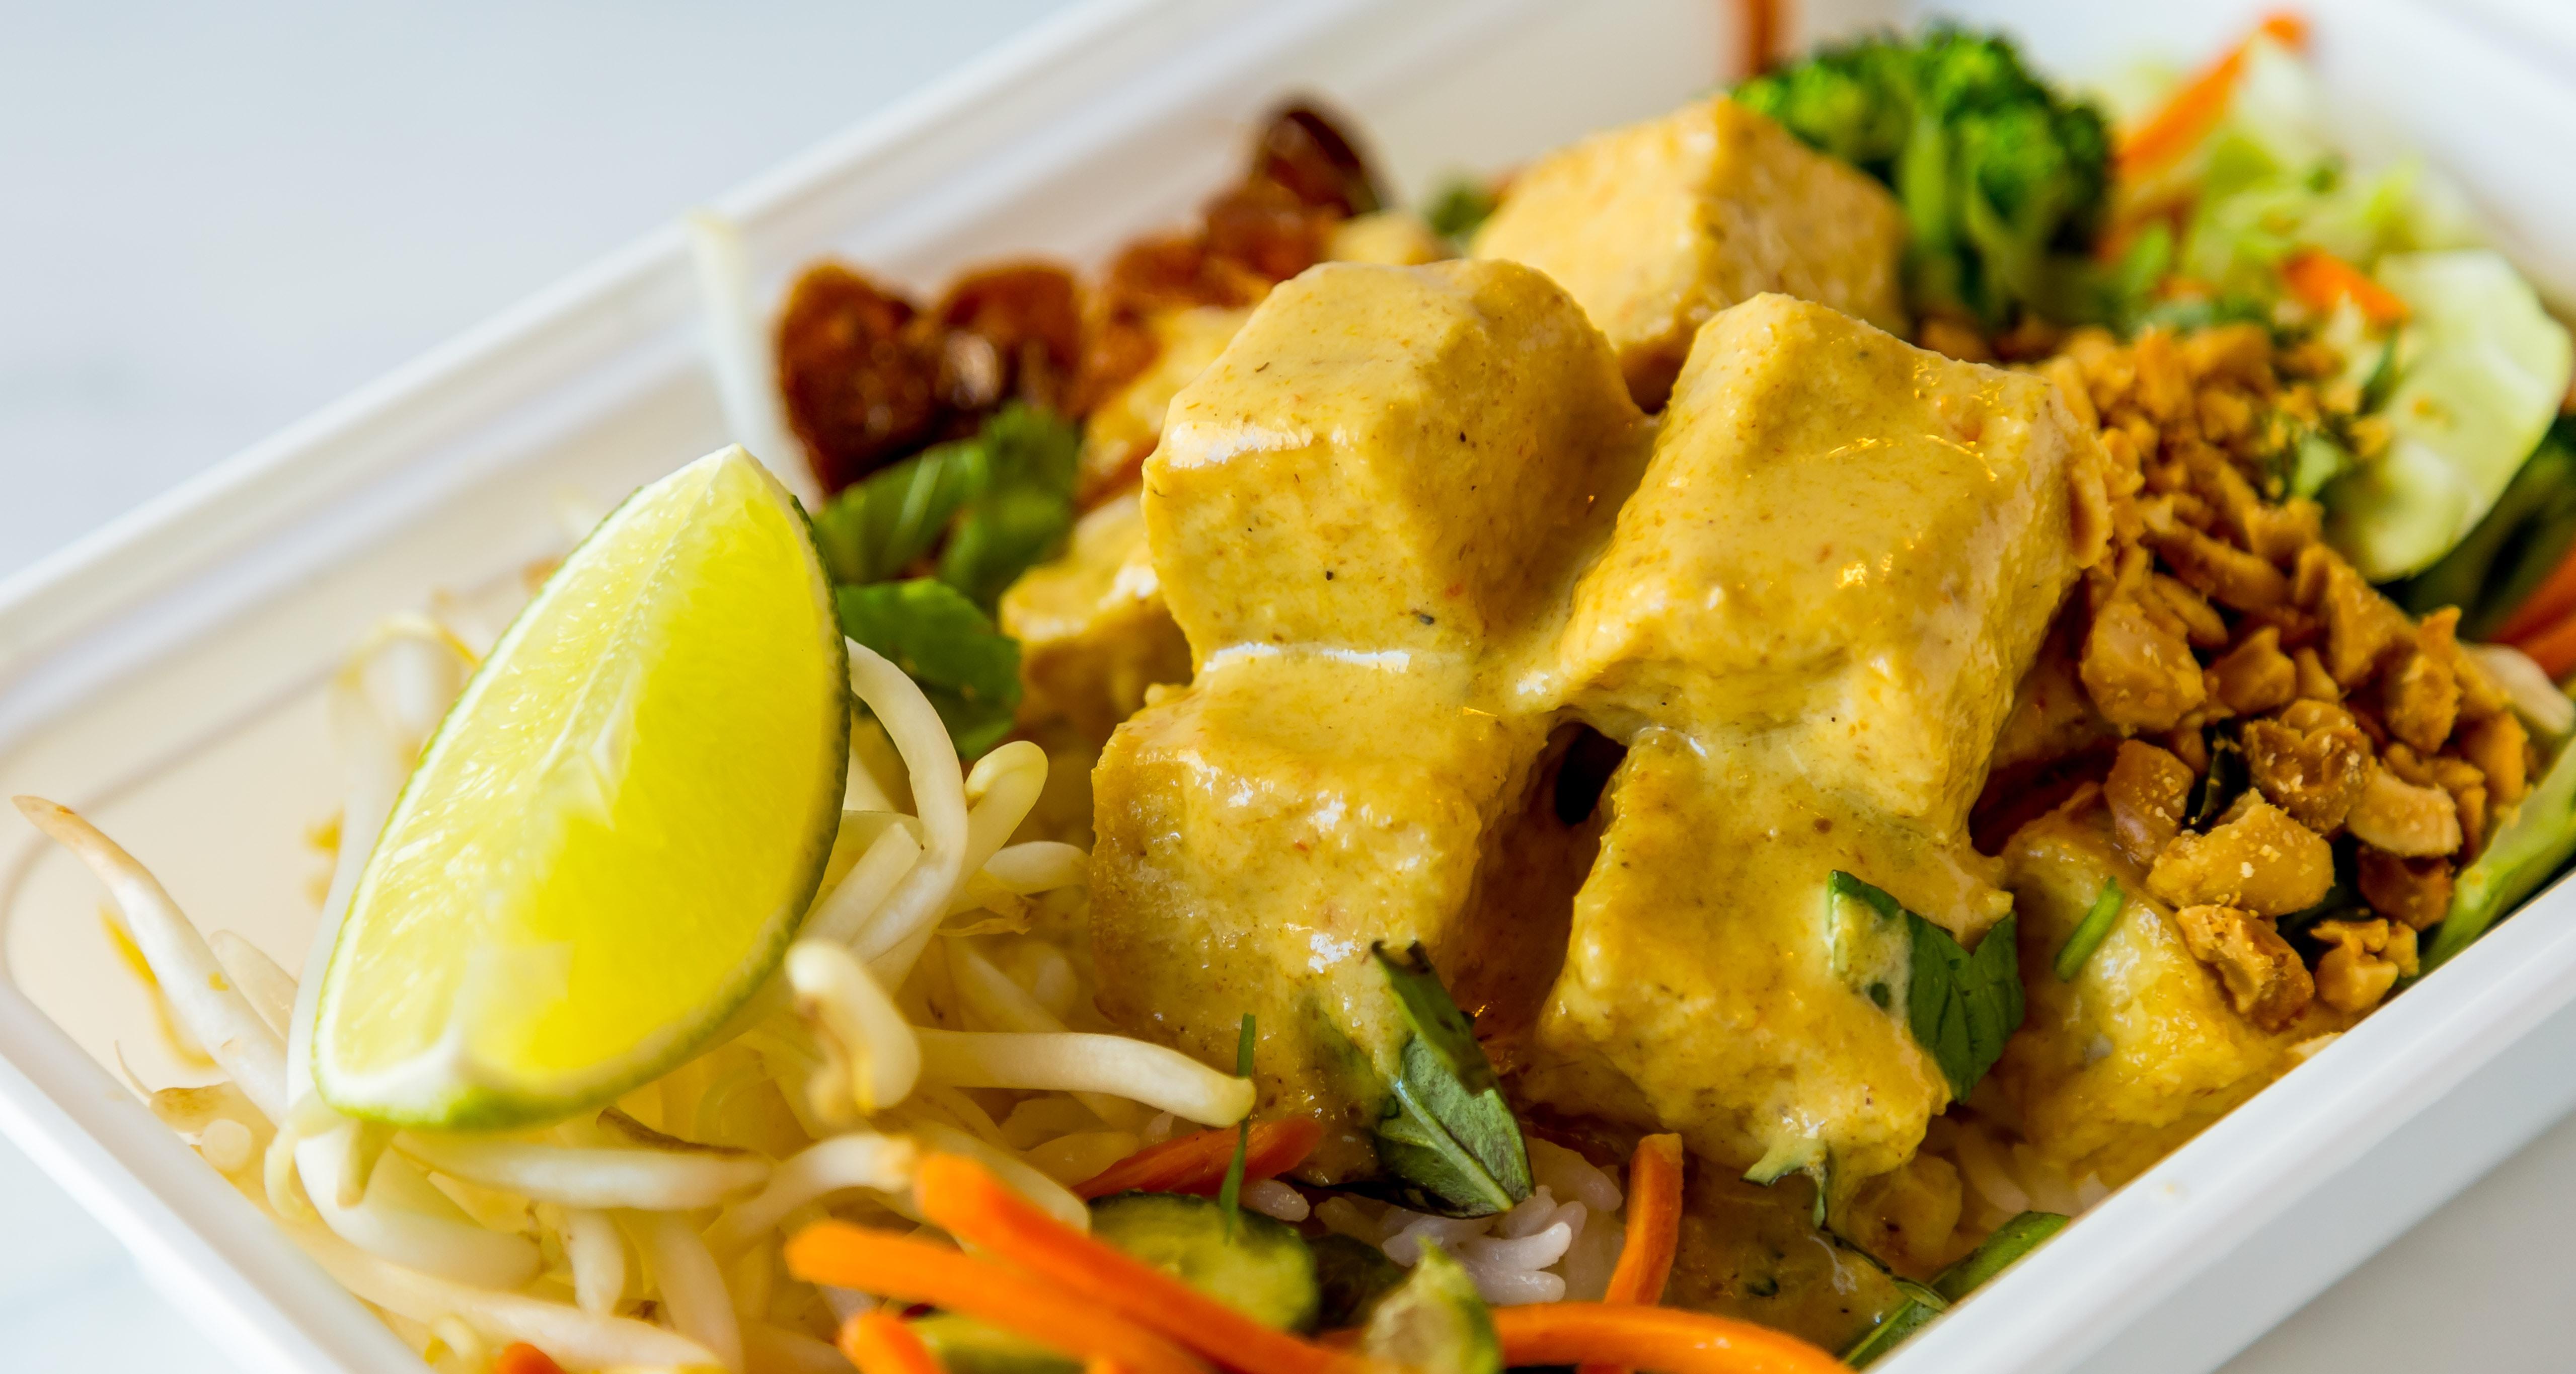 Entrée Box: TOFU - Coconut Curry